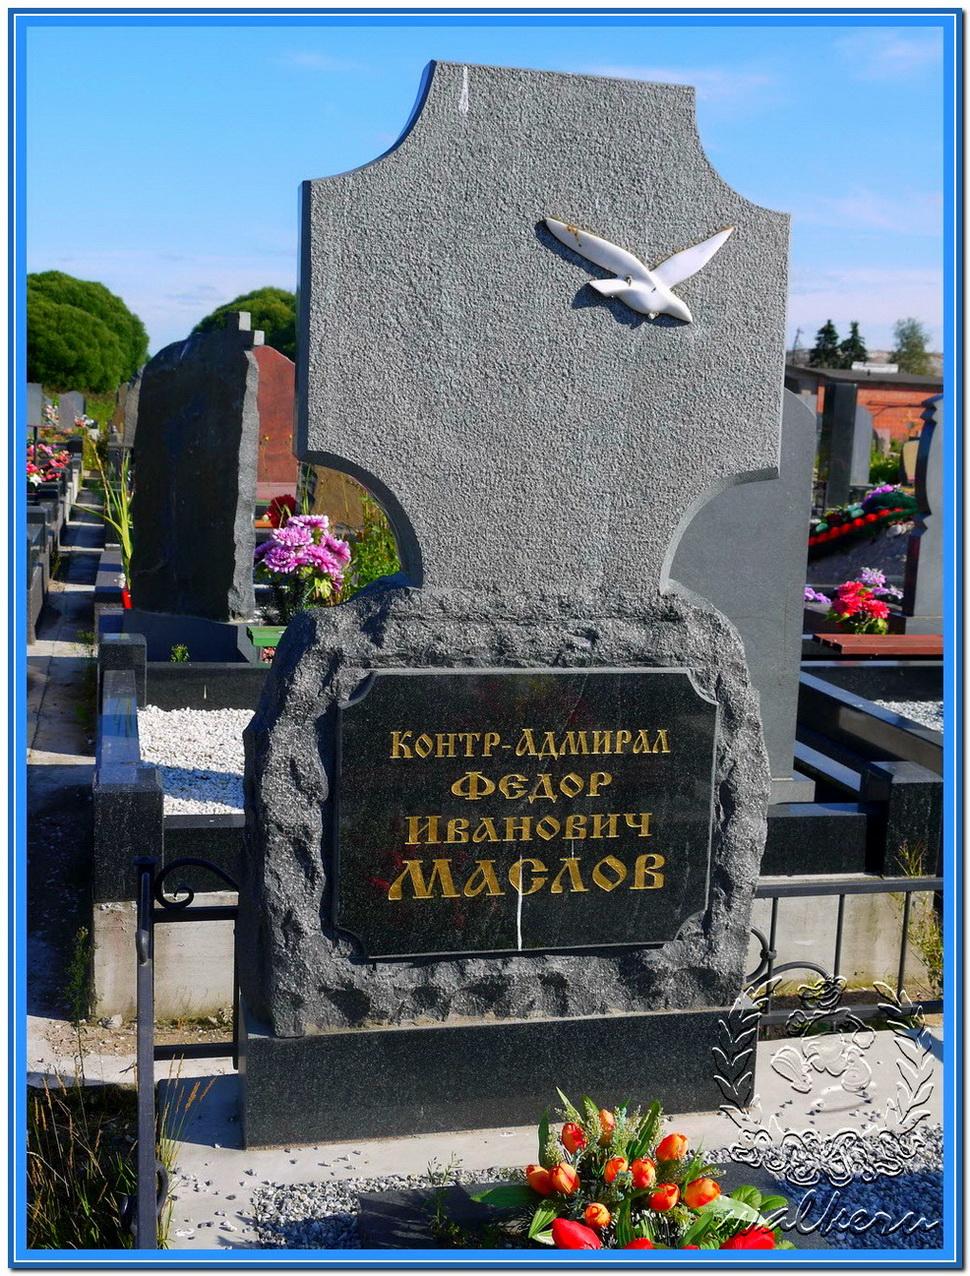 Маслов Фёдор Иванович